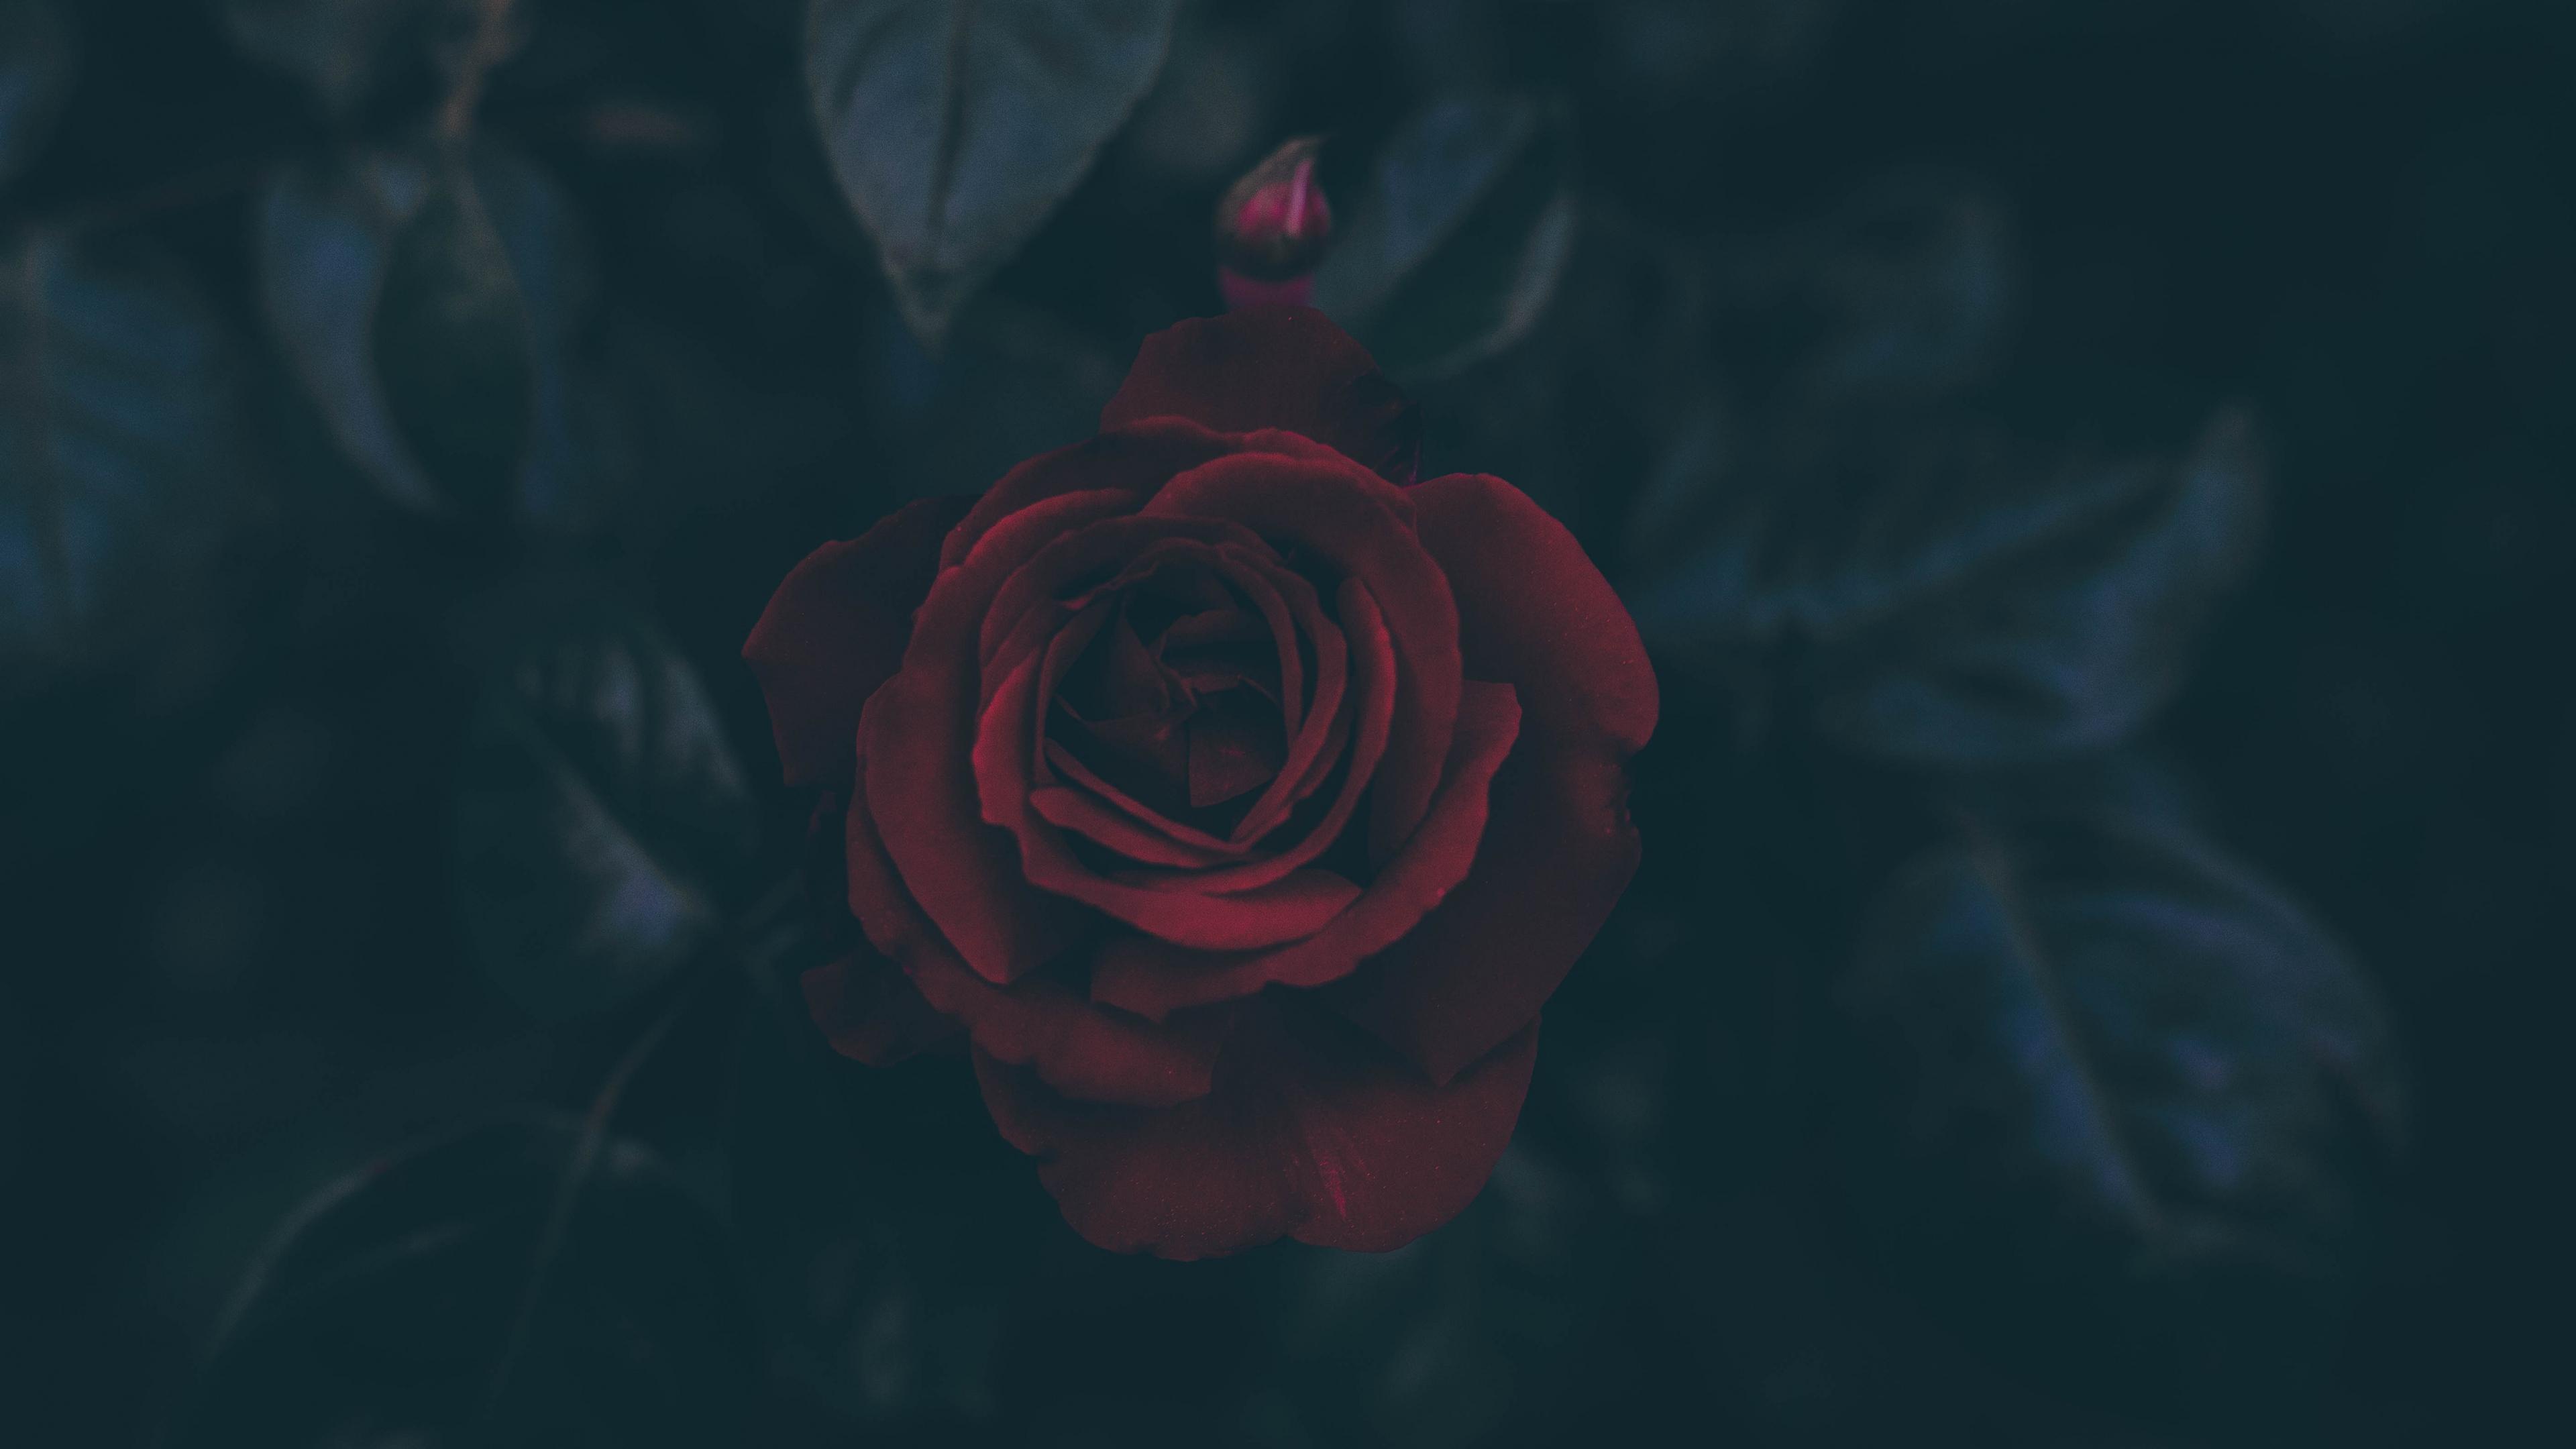 Rose 4k Ultra HD Wallpaper